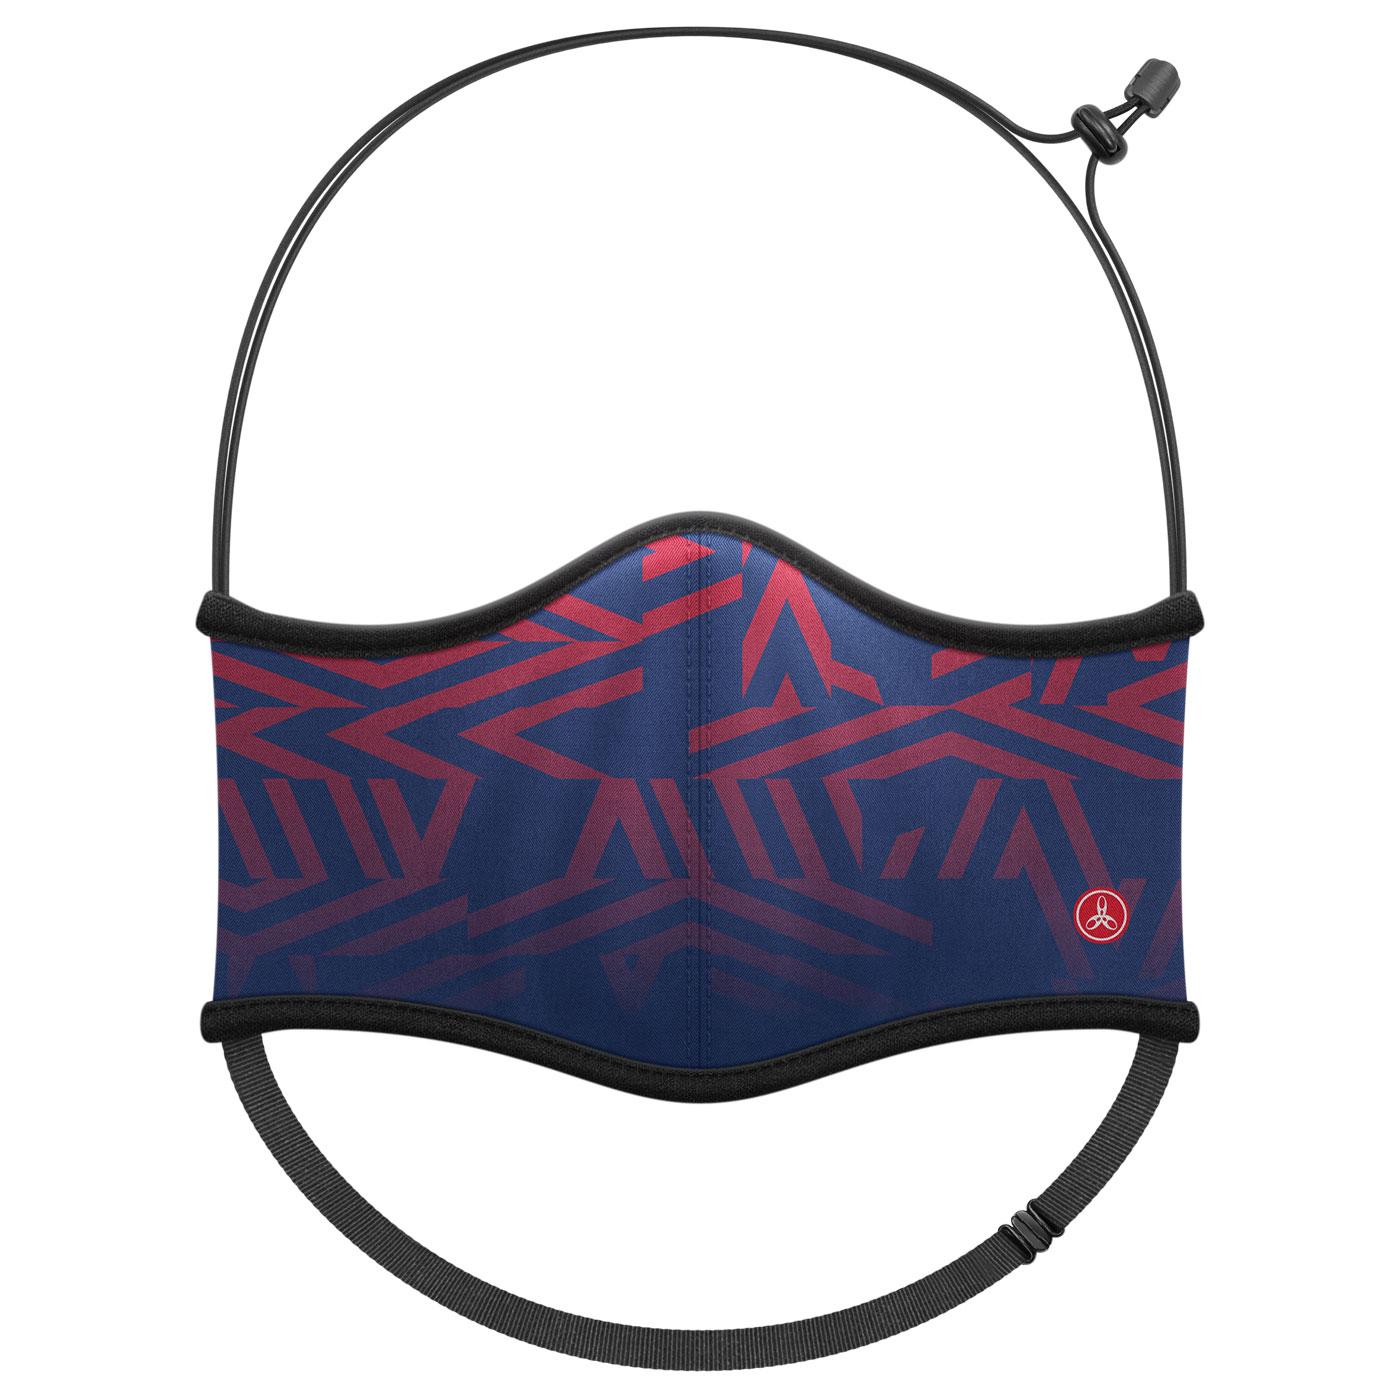 HODARLA 運動舒適口罩6032219 - 深藍紅